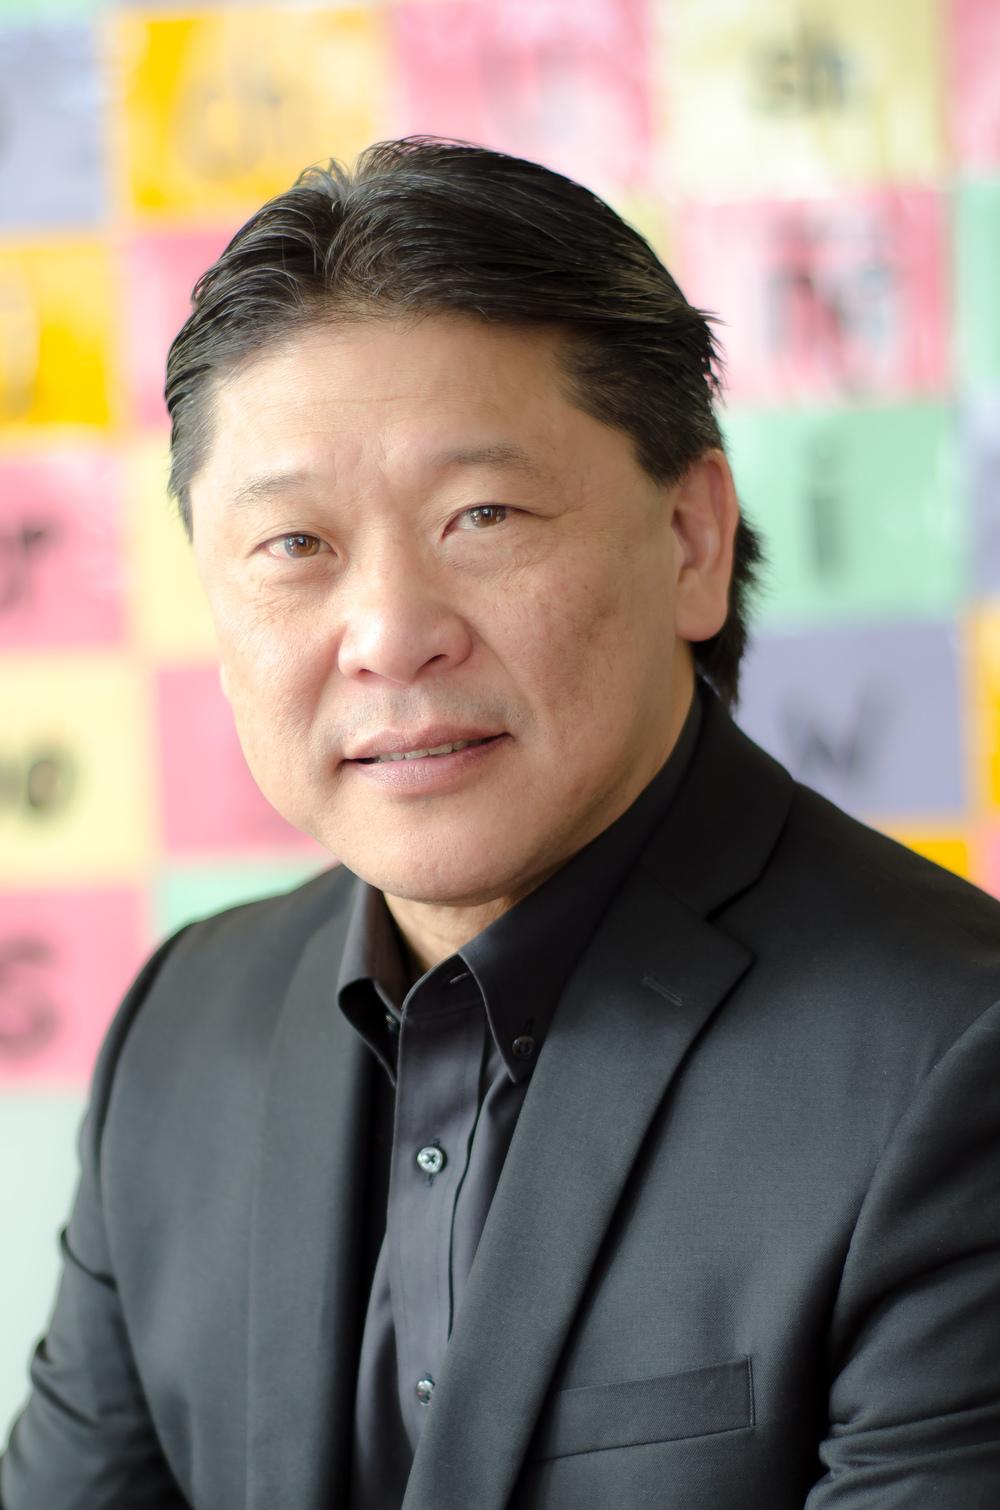 Staff_PastorHuang.jpg